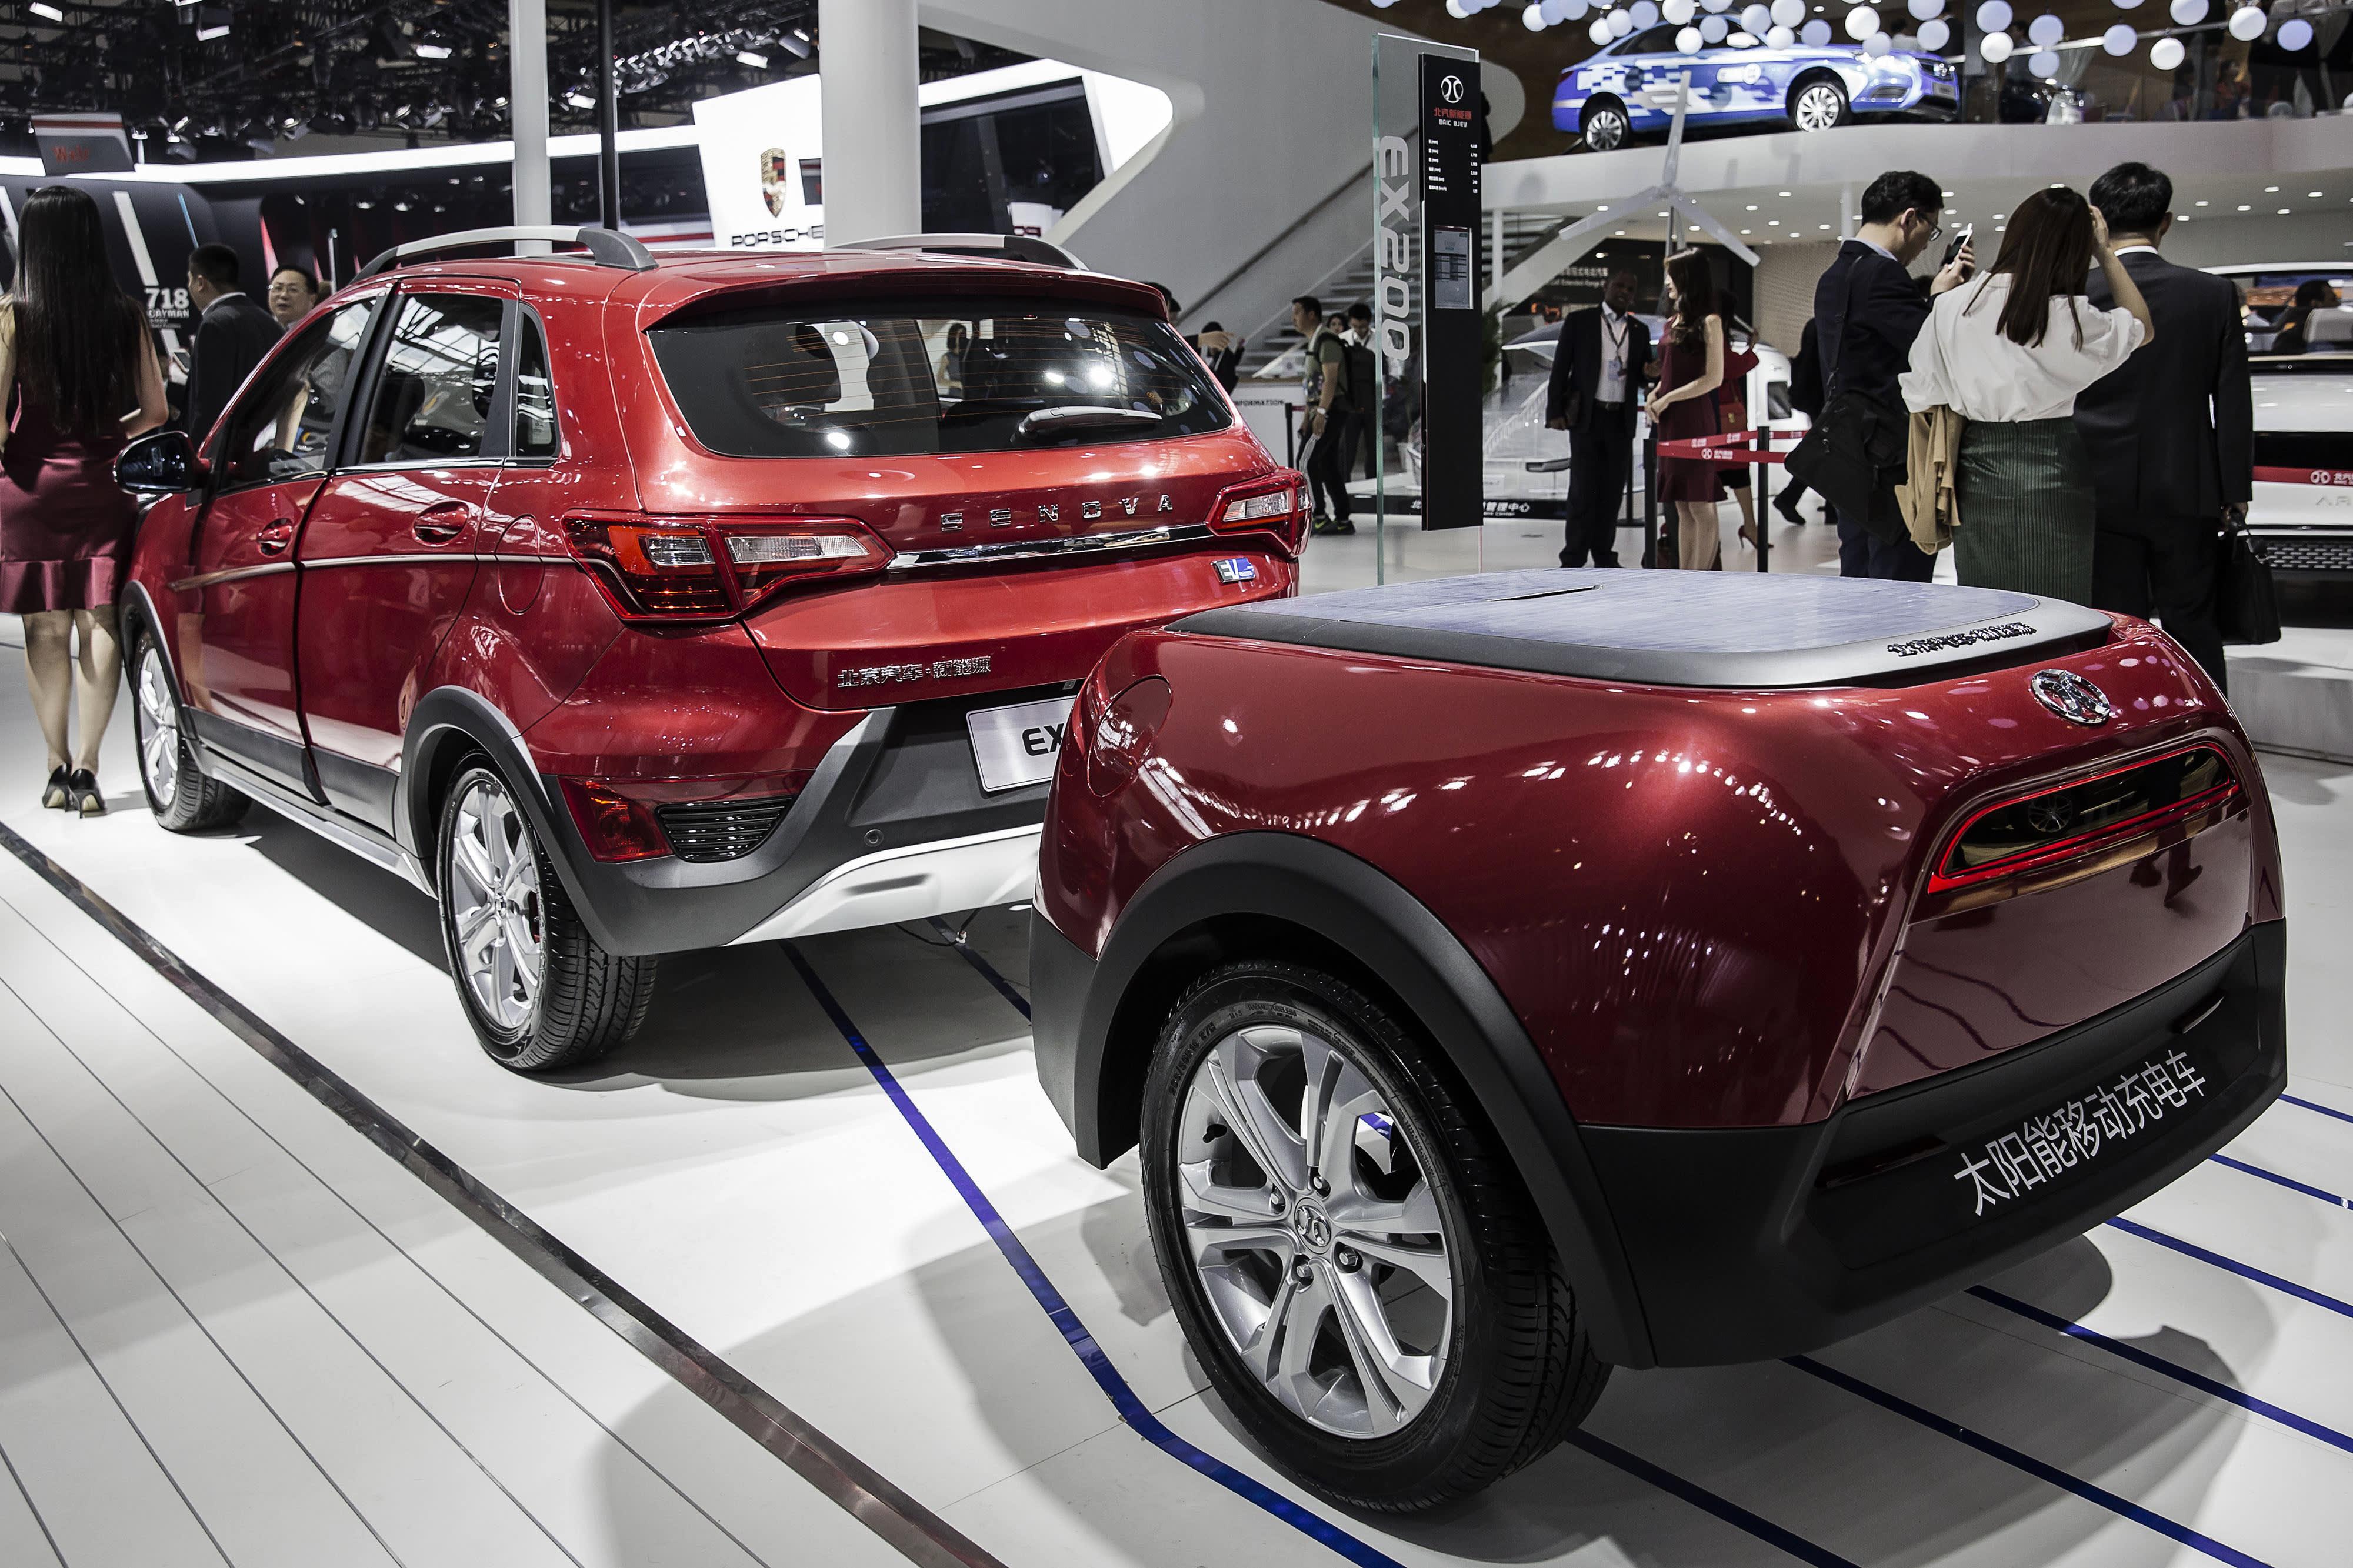 SUVs Dominate The Beijing Auto Show - Sport vehicles